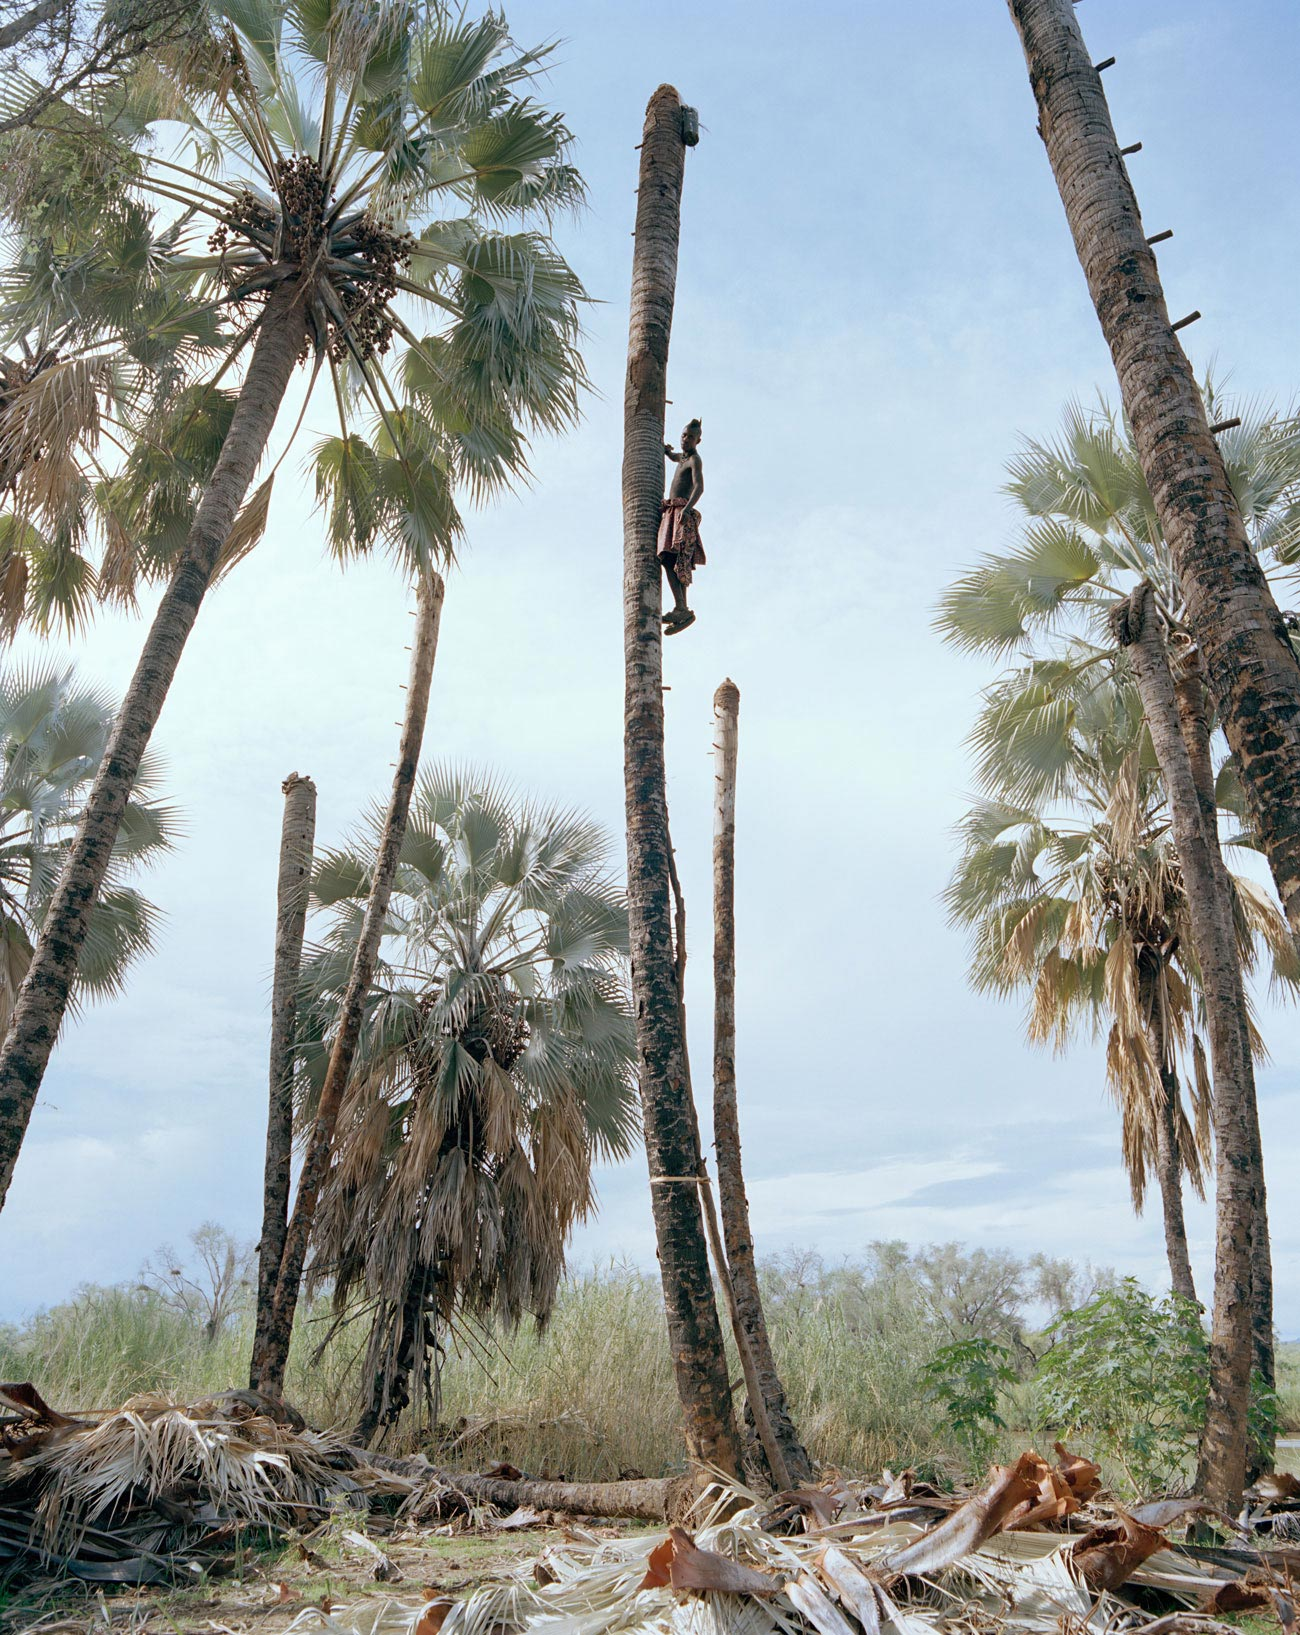 palm-wine-collectors-kyle-weeks-8